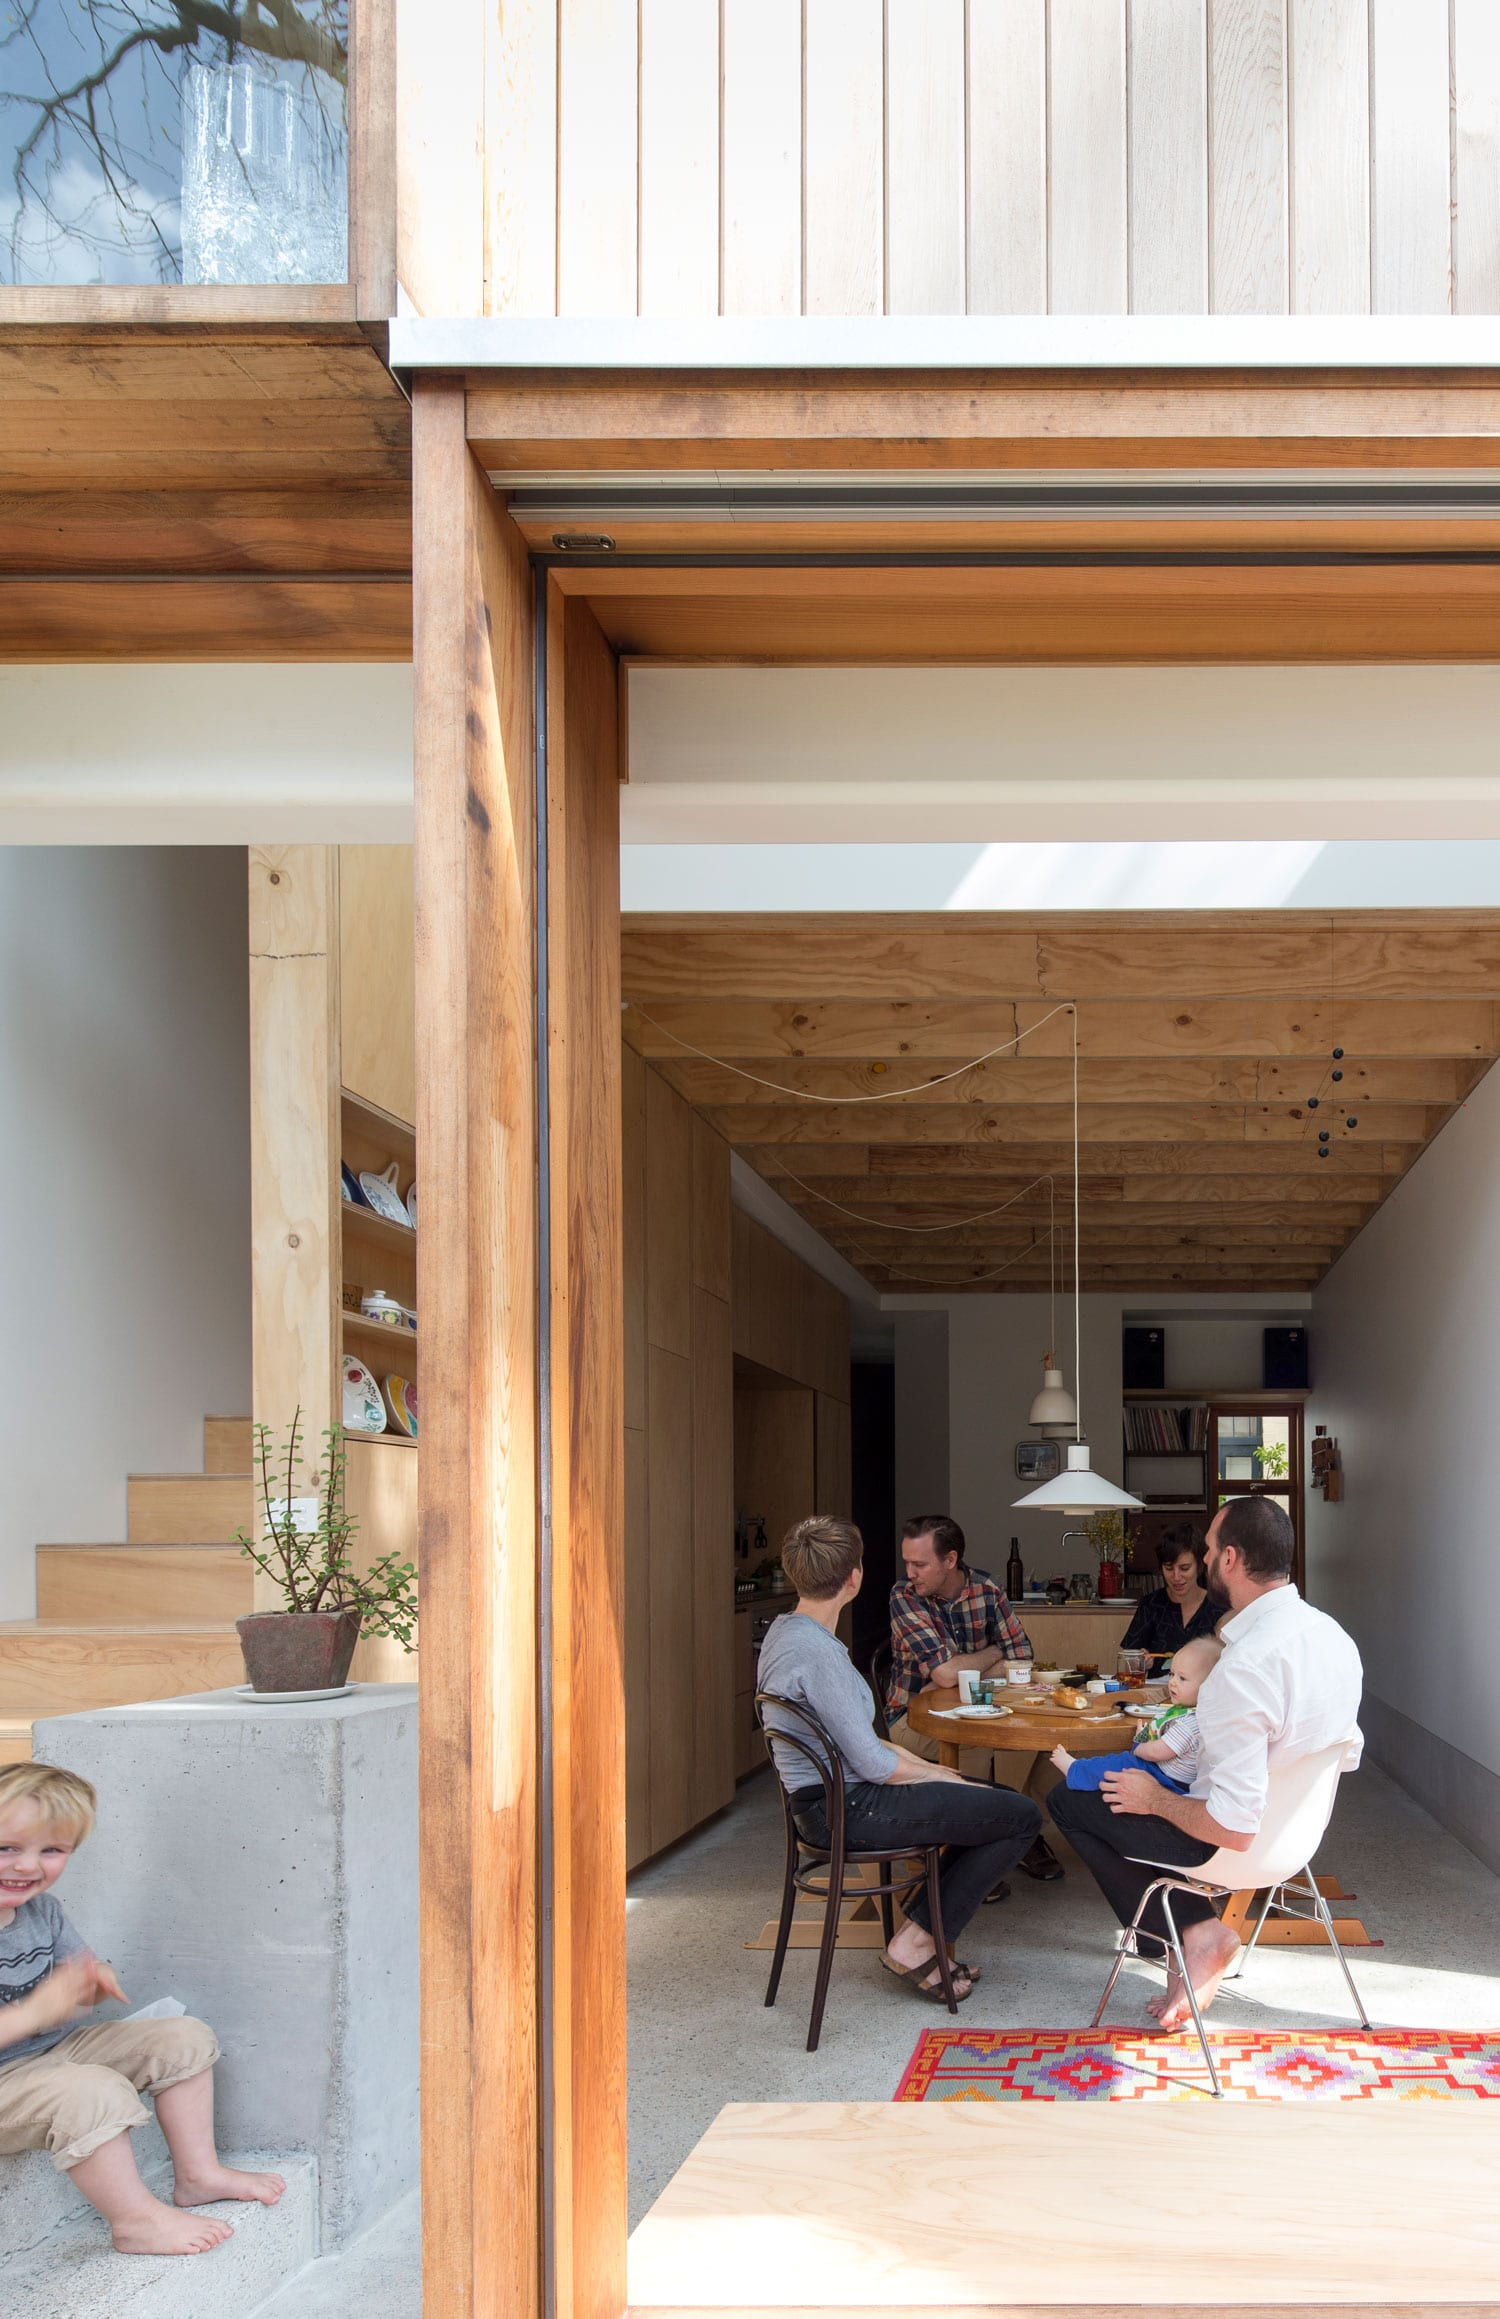 3x2 House, Sydney by panovscott | Yellowtrace